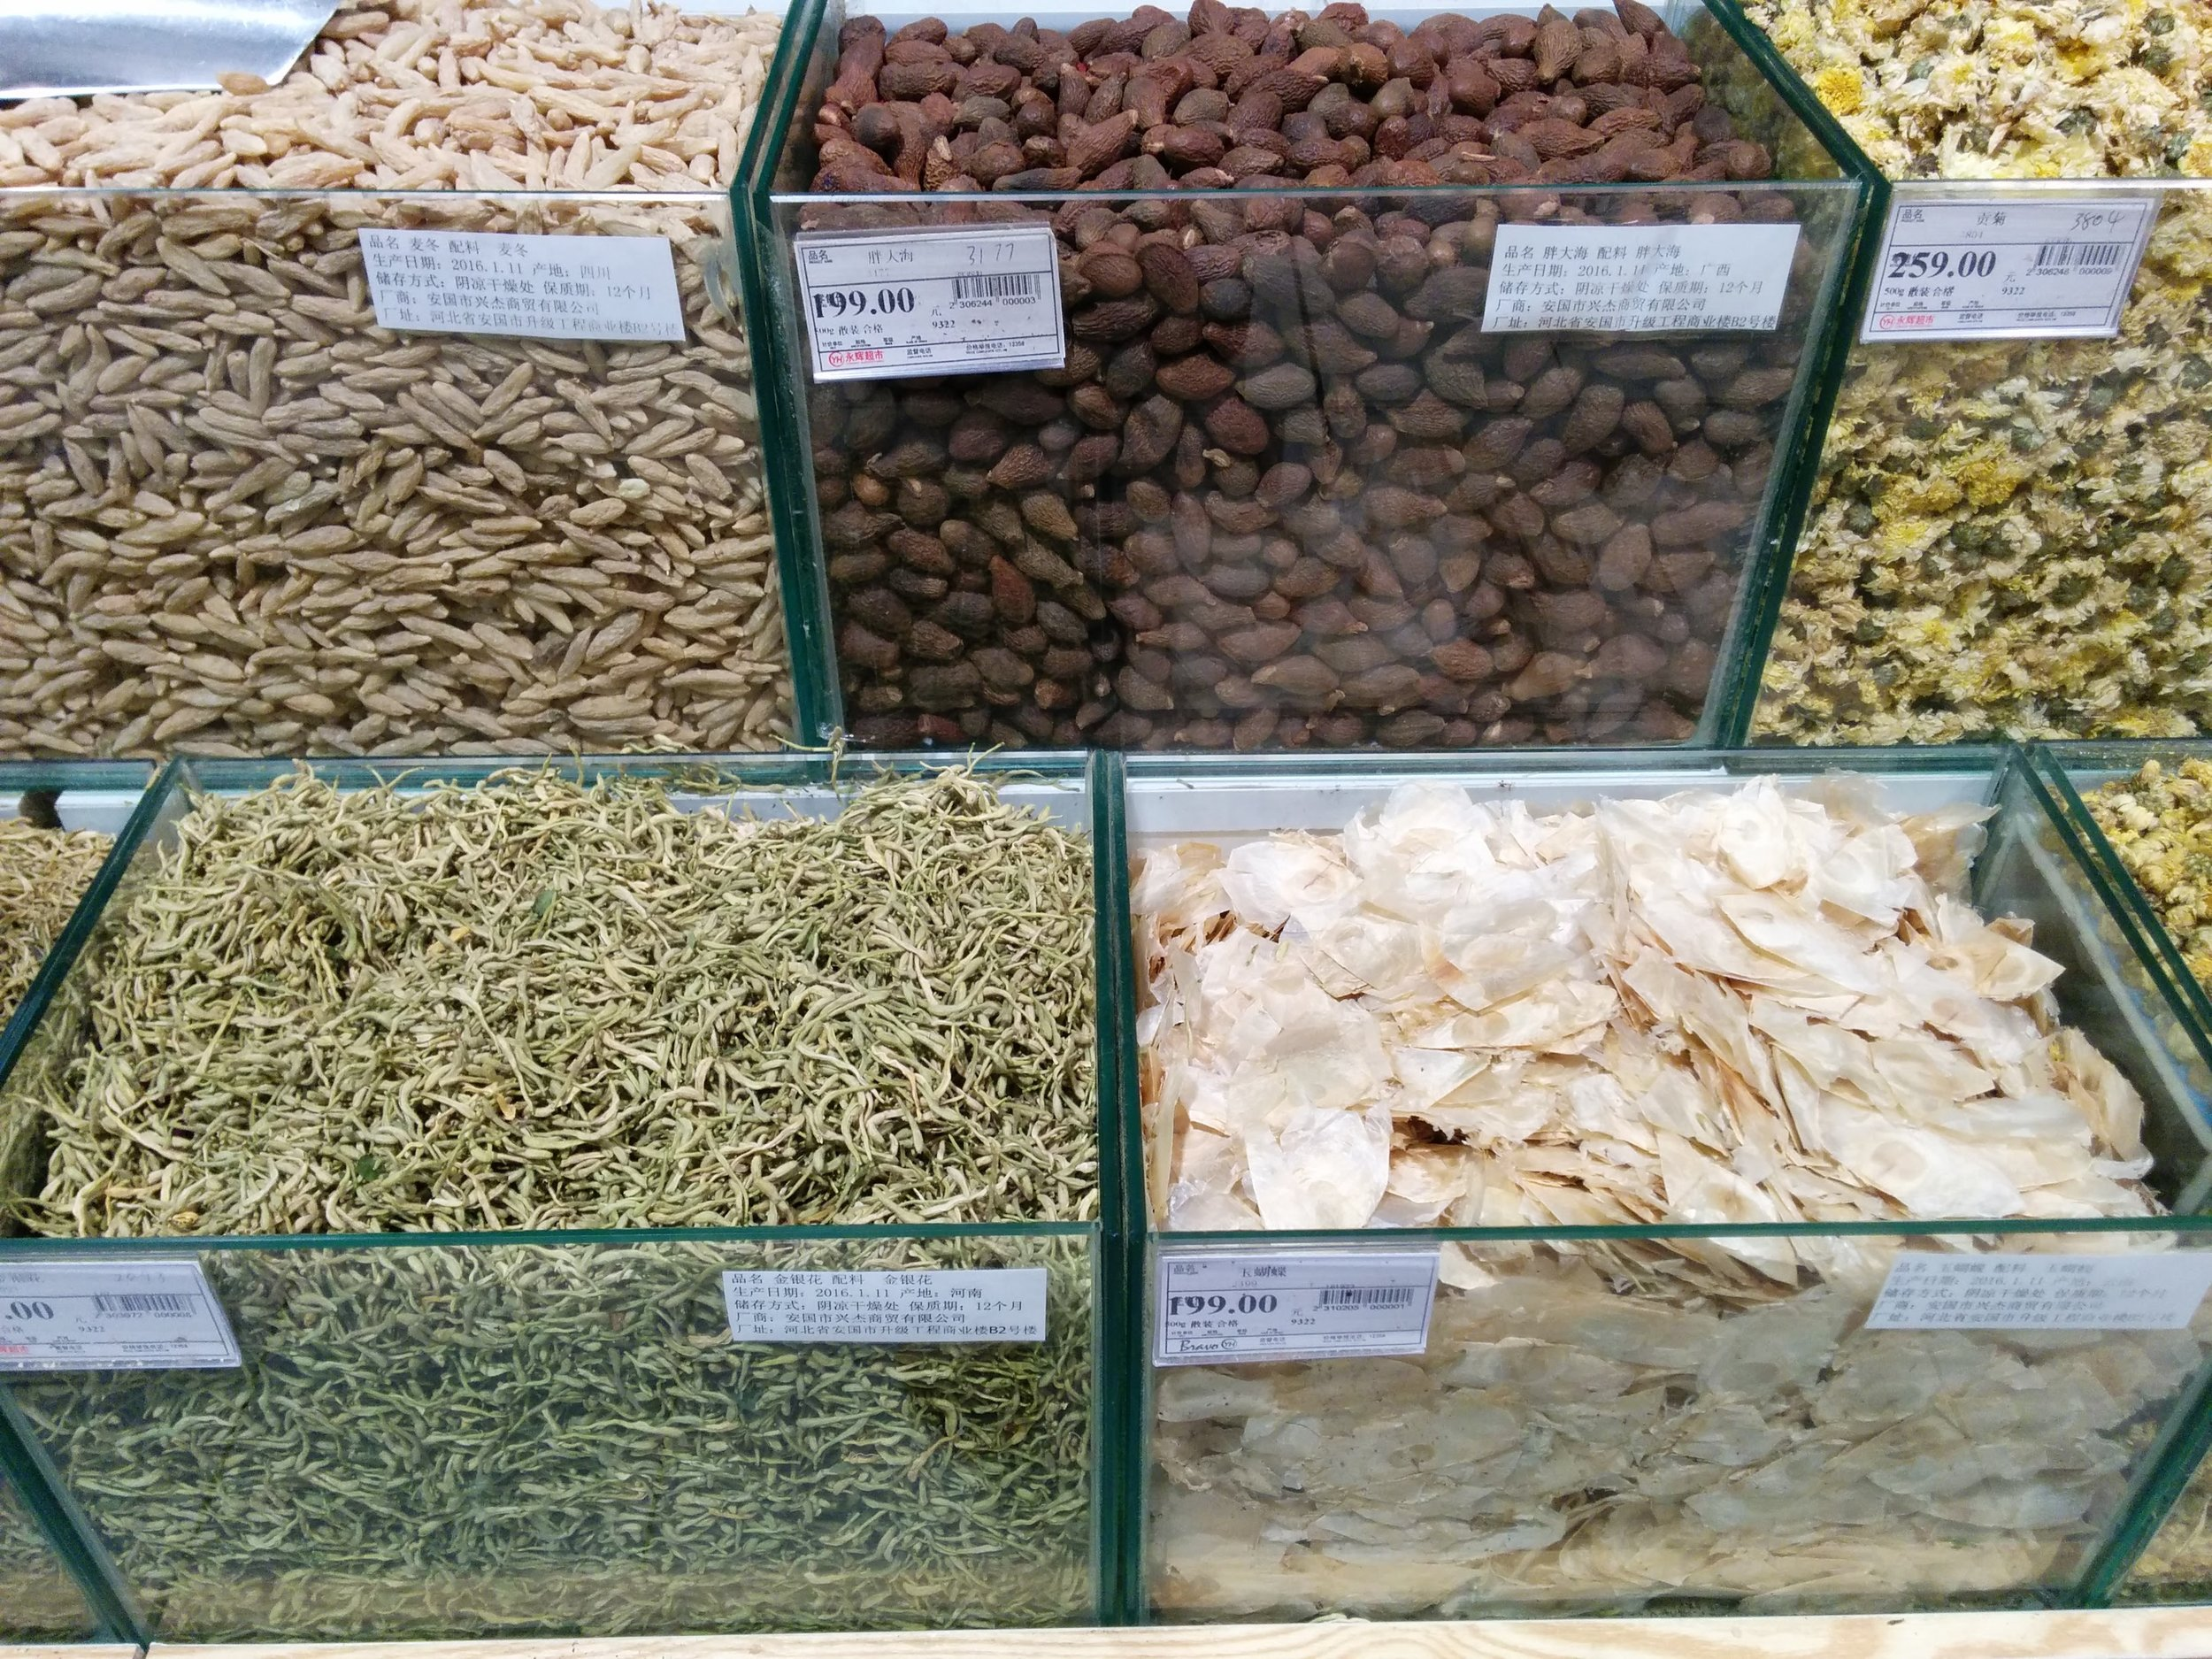 Chinese herbs (Mai Men Dong 麥門冬, Pang Da Hai 胖大海, Ju Hua 菊花, Jin Yin Hua 金银花, Yu Mu Die 玉蝴蝶) in Beijing supermarket